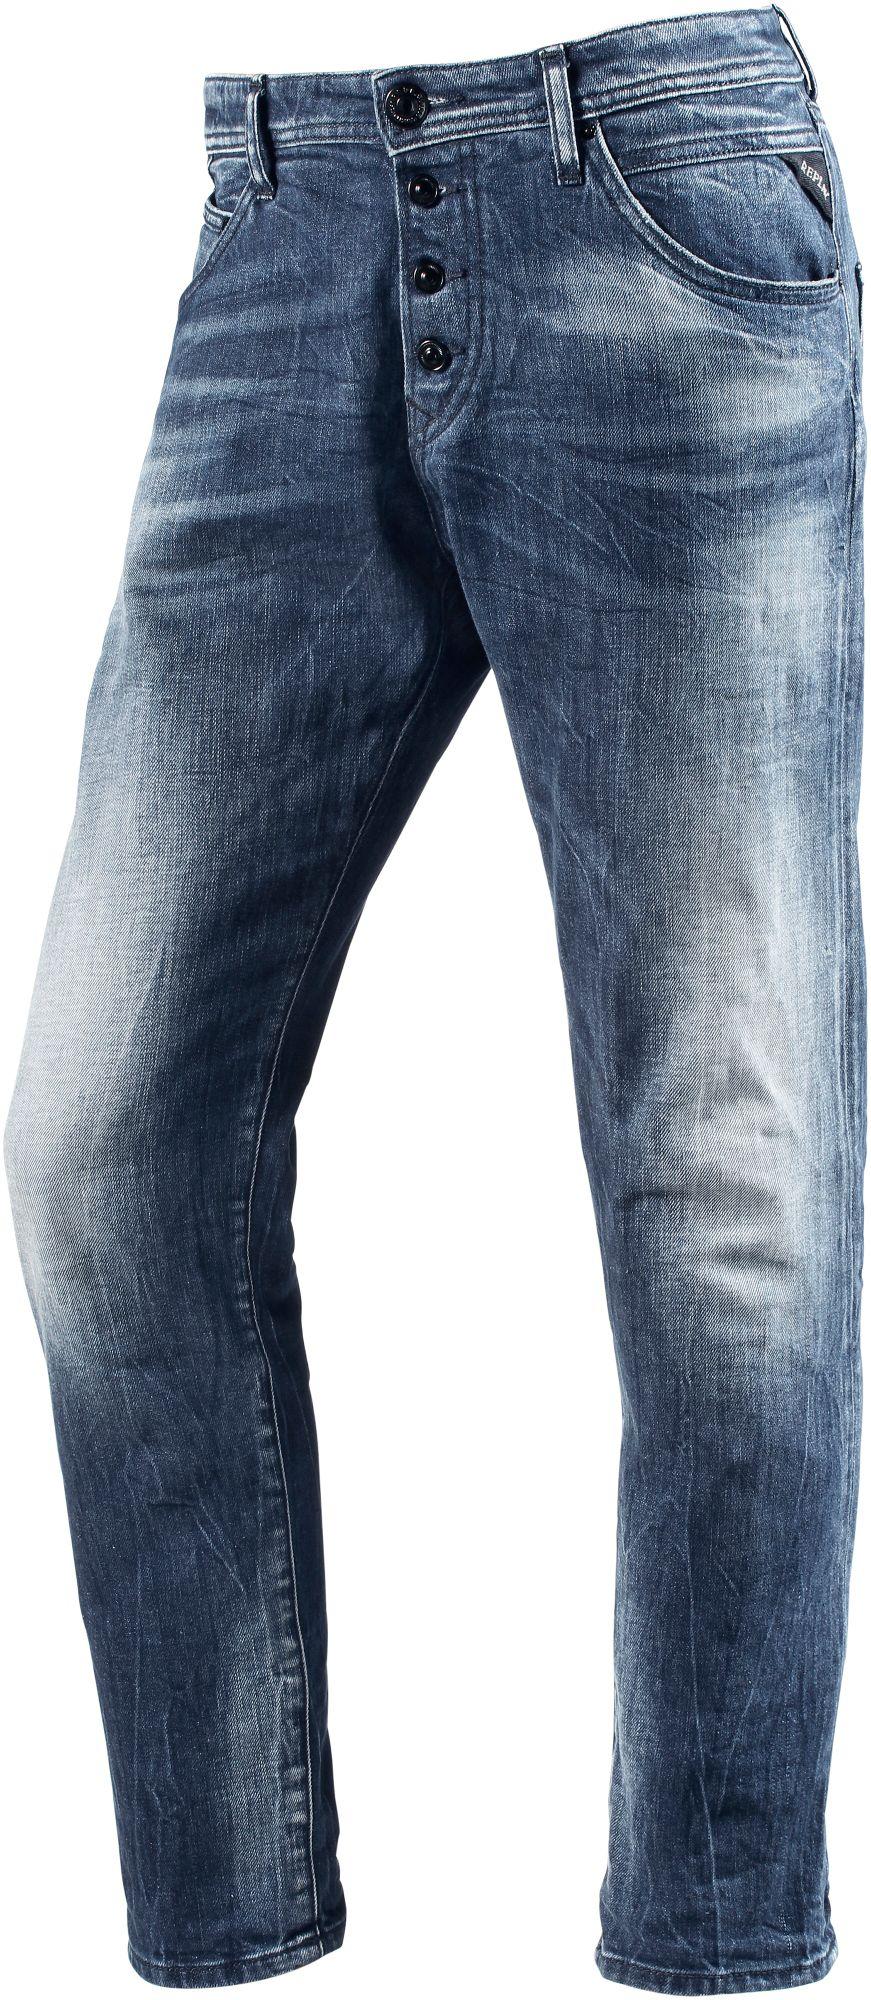 replay pilar preisvergleich jeans g nstig kaufen bei. Black Bedroom Furniture Sets. Home Design Ideas